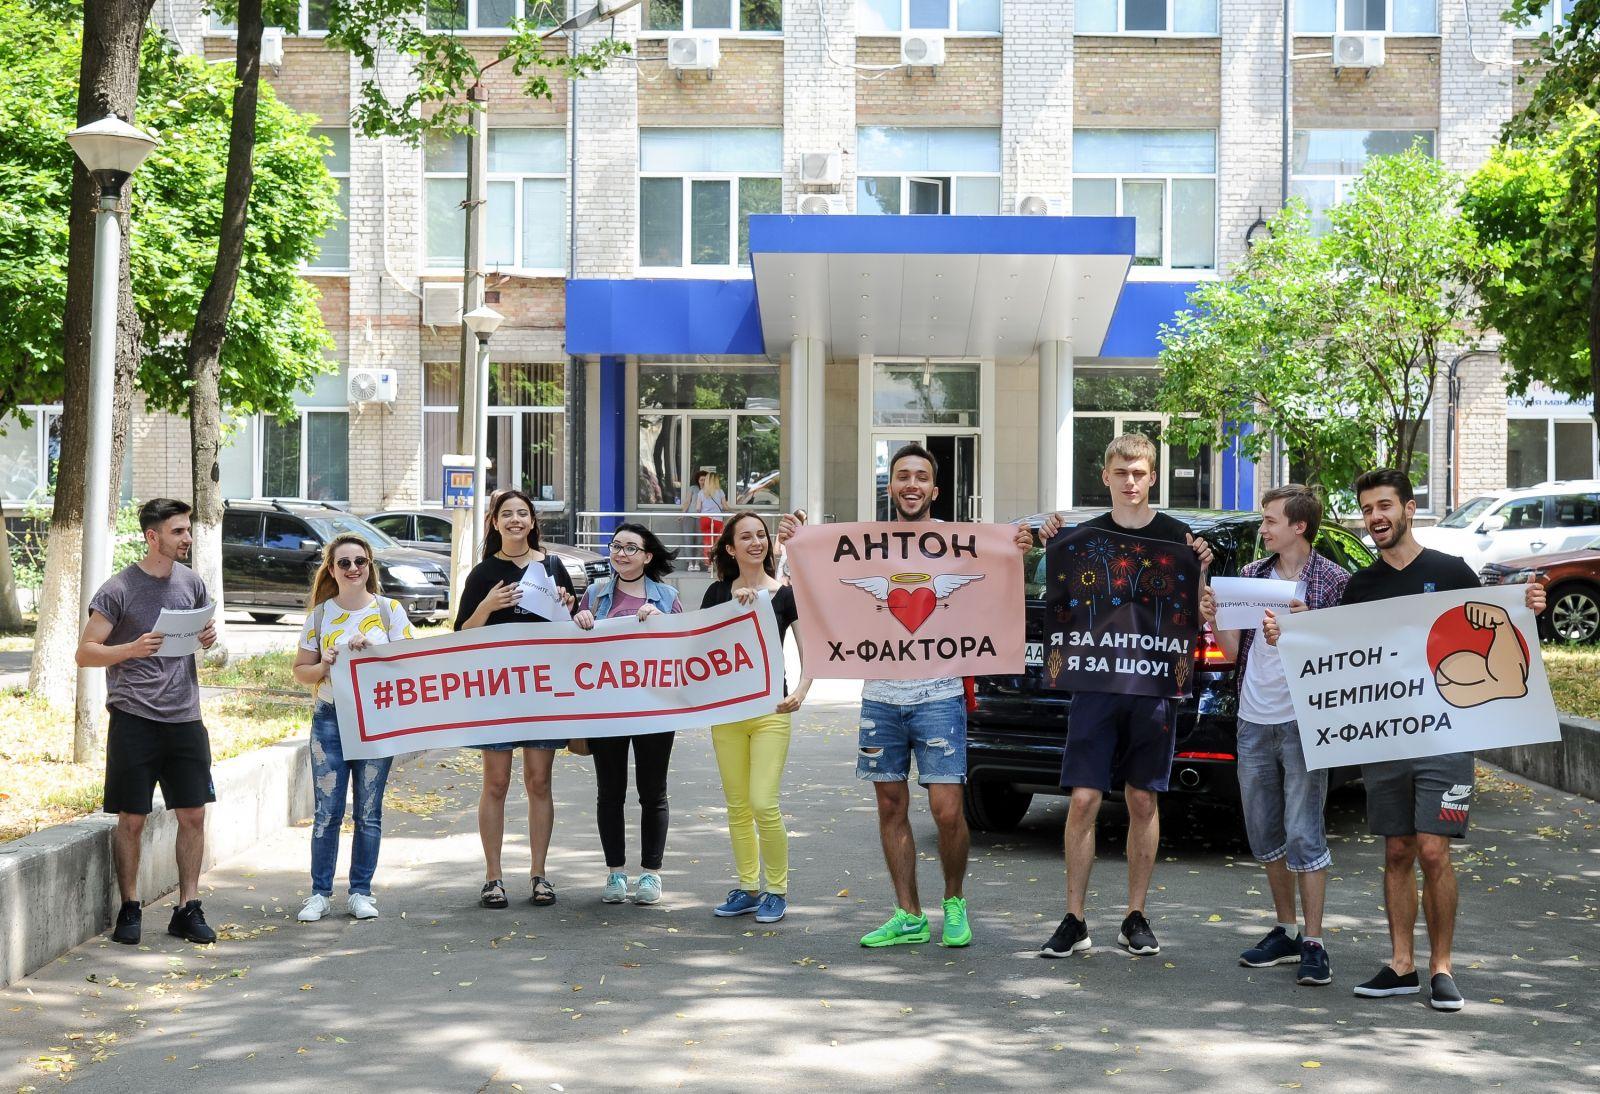 "Фанаты Антона Савлепова протестуют против нового состава жюри ""Х-фактора 8"""